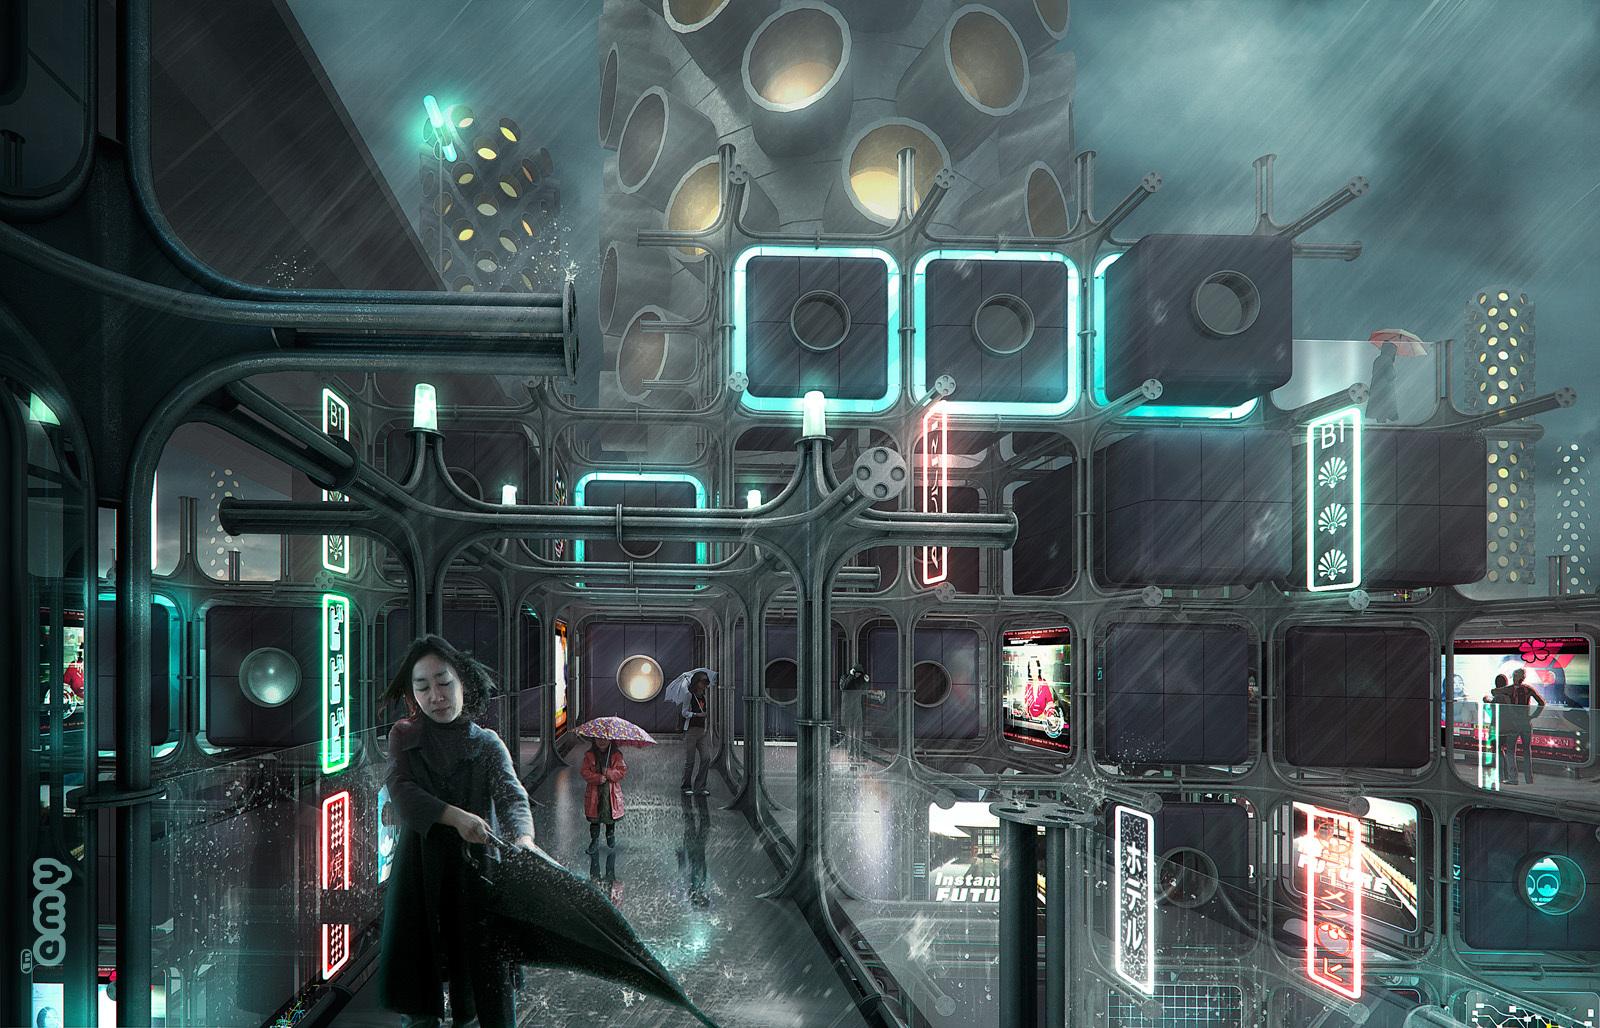 Citylife emy 02